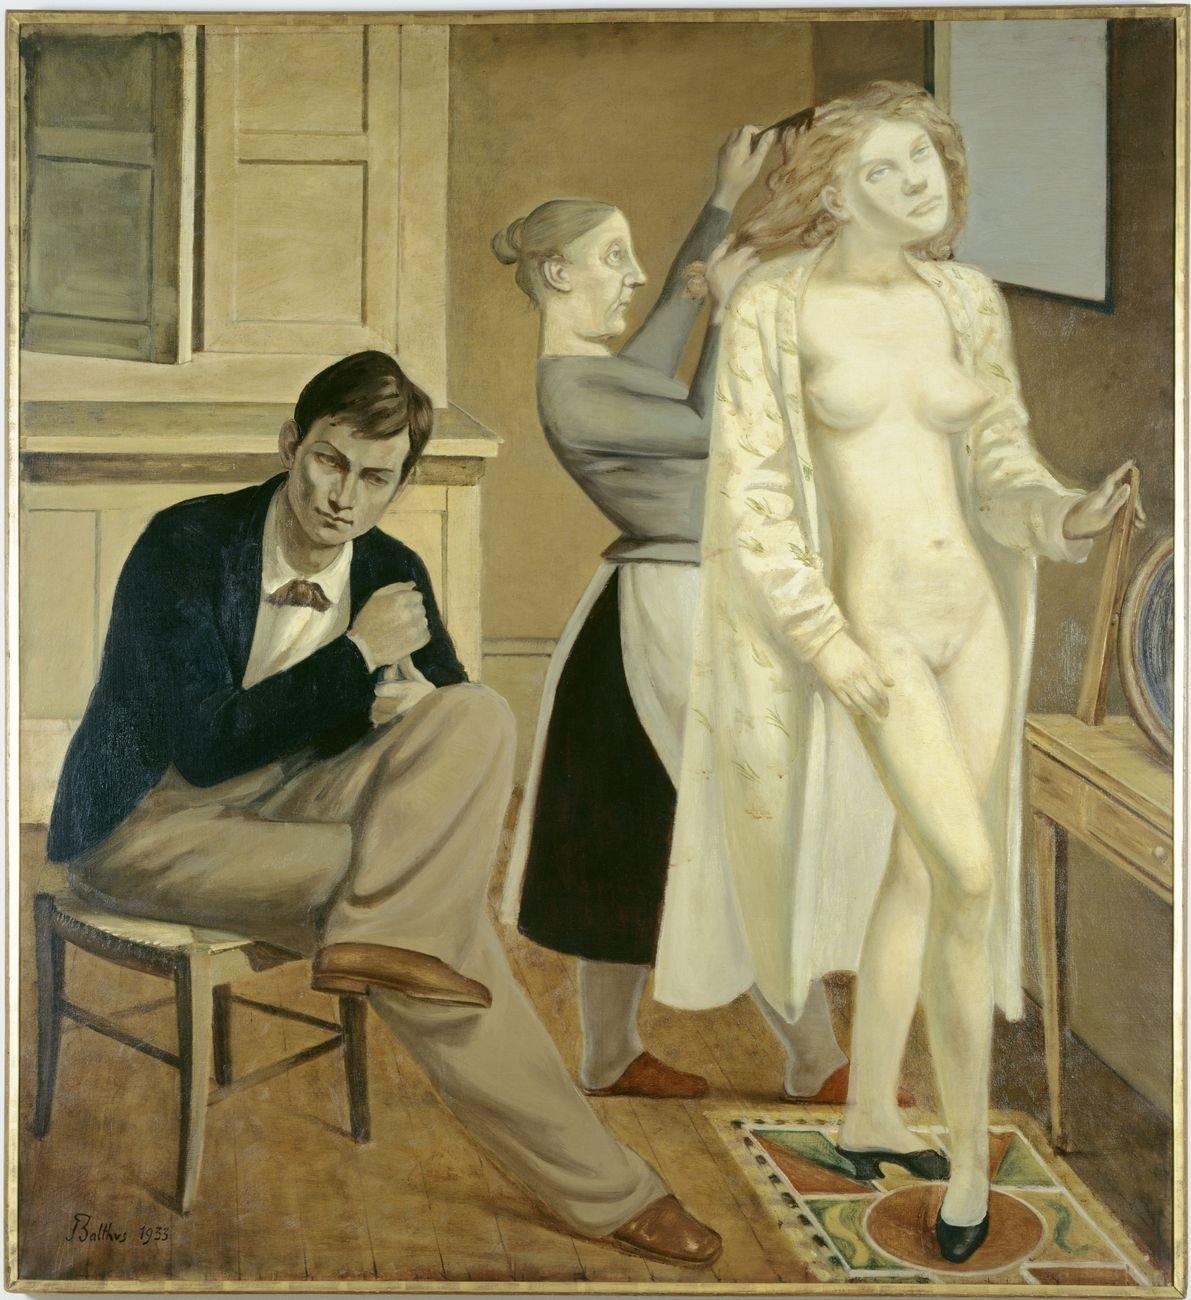 Balthus, La Toilette de Cathy, 1933, olio su tela, cm 165 x 150. Centre Pompidou, Parigi © Balthus. Photo © Jean-Claude Planchet